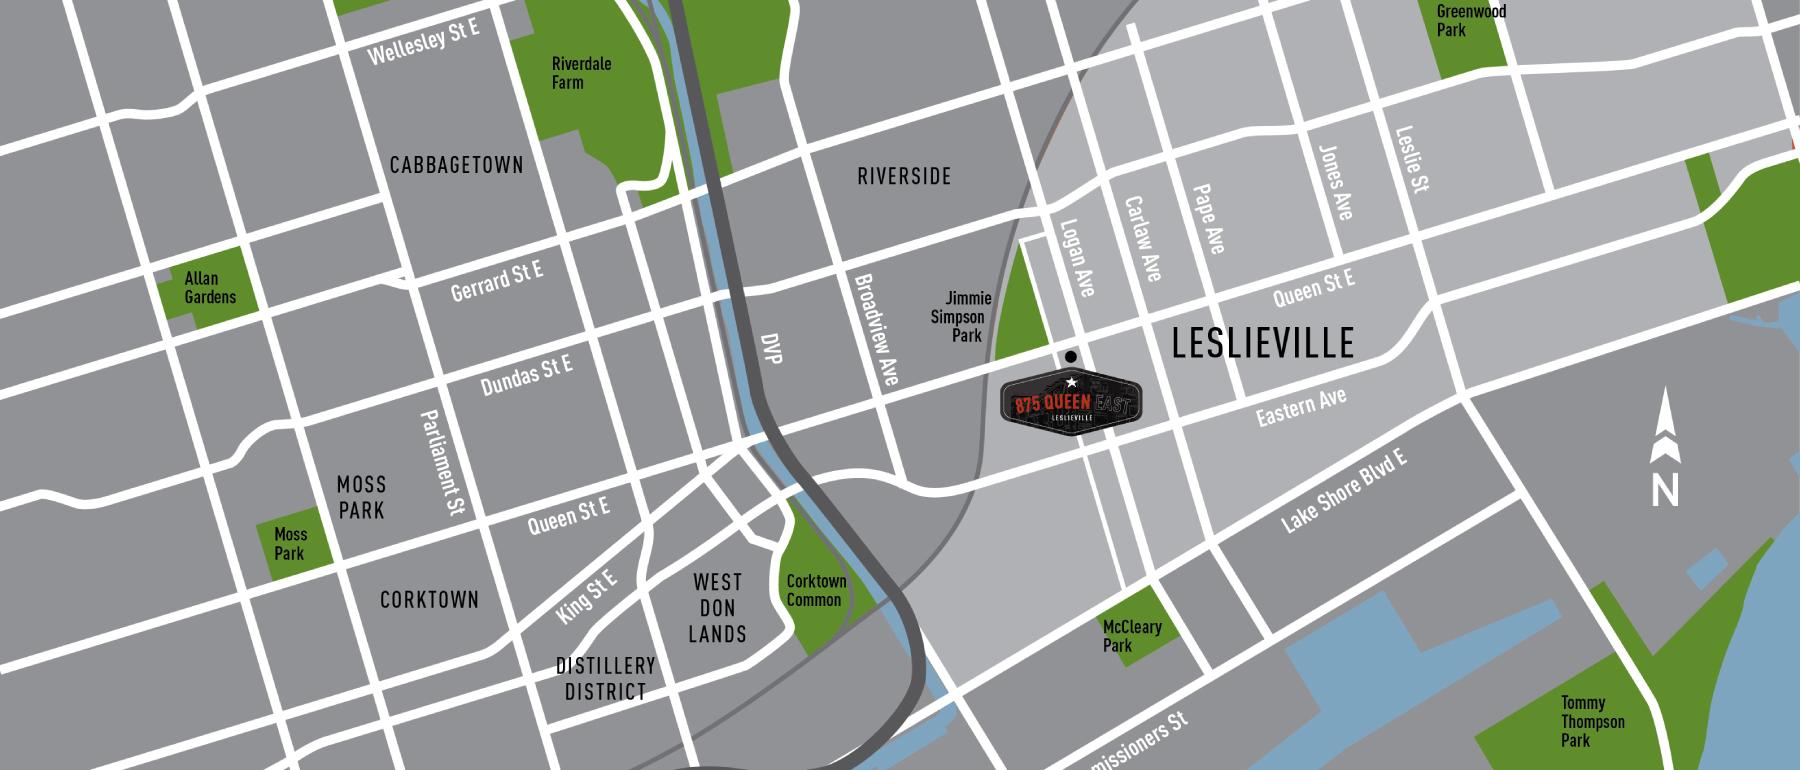 875 Queen East Condos Map View Toronto, Canada